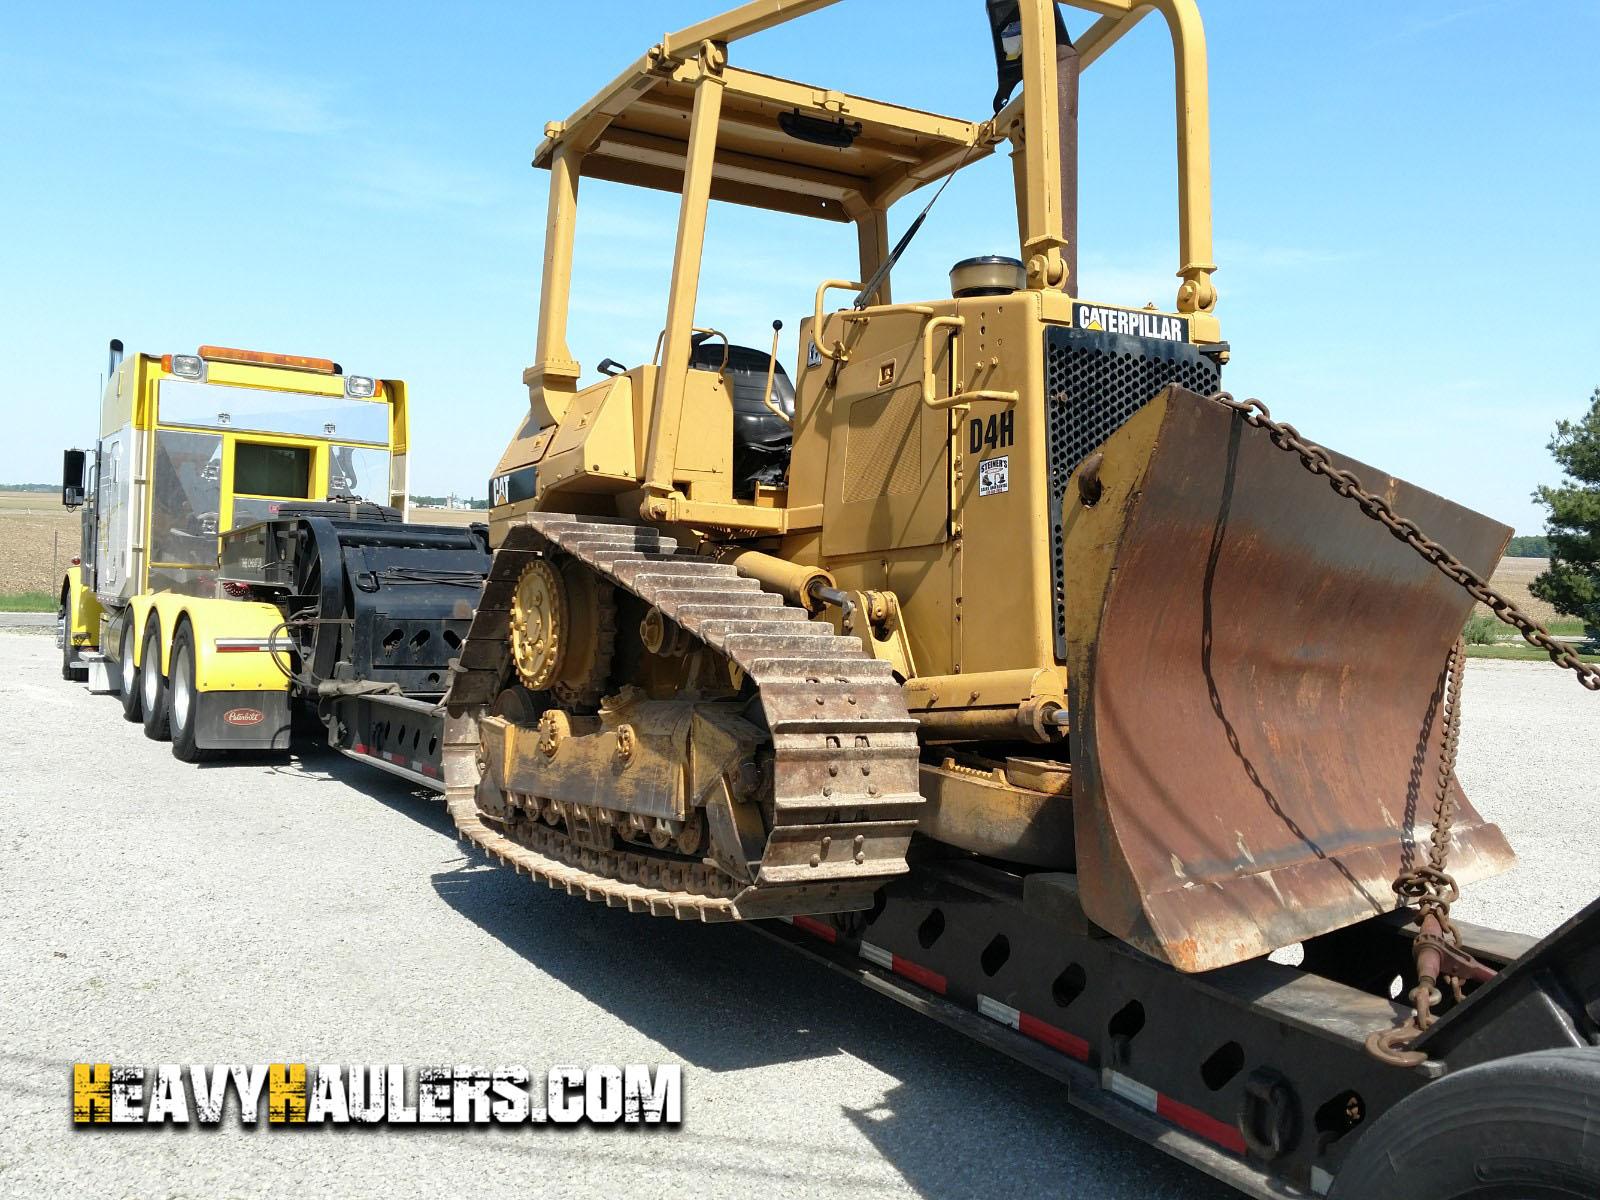 Hauling a Caterpillar D4H bulldozer on a 8 axle trailer